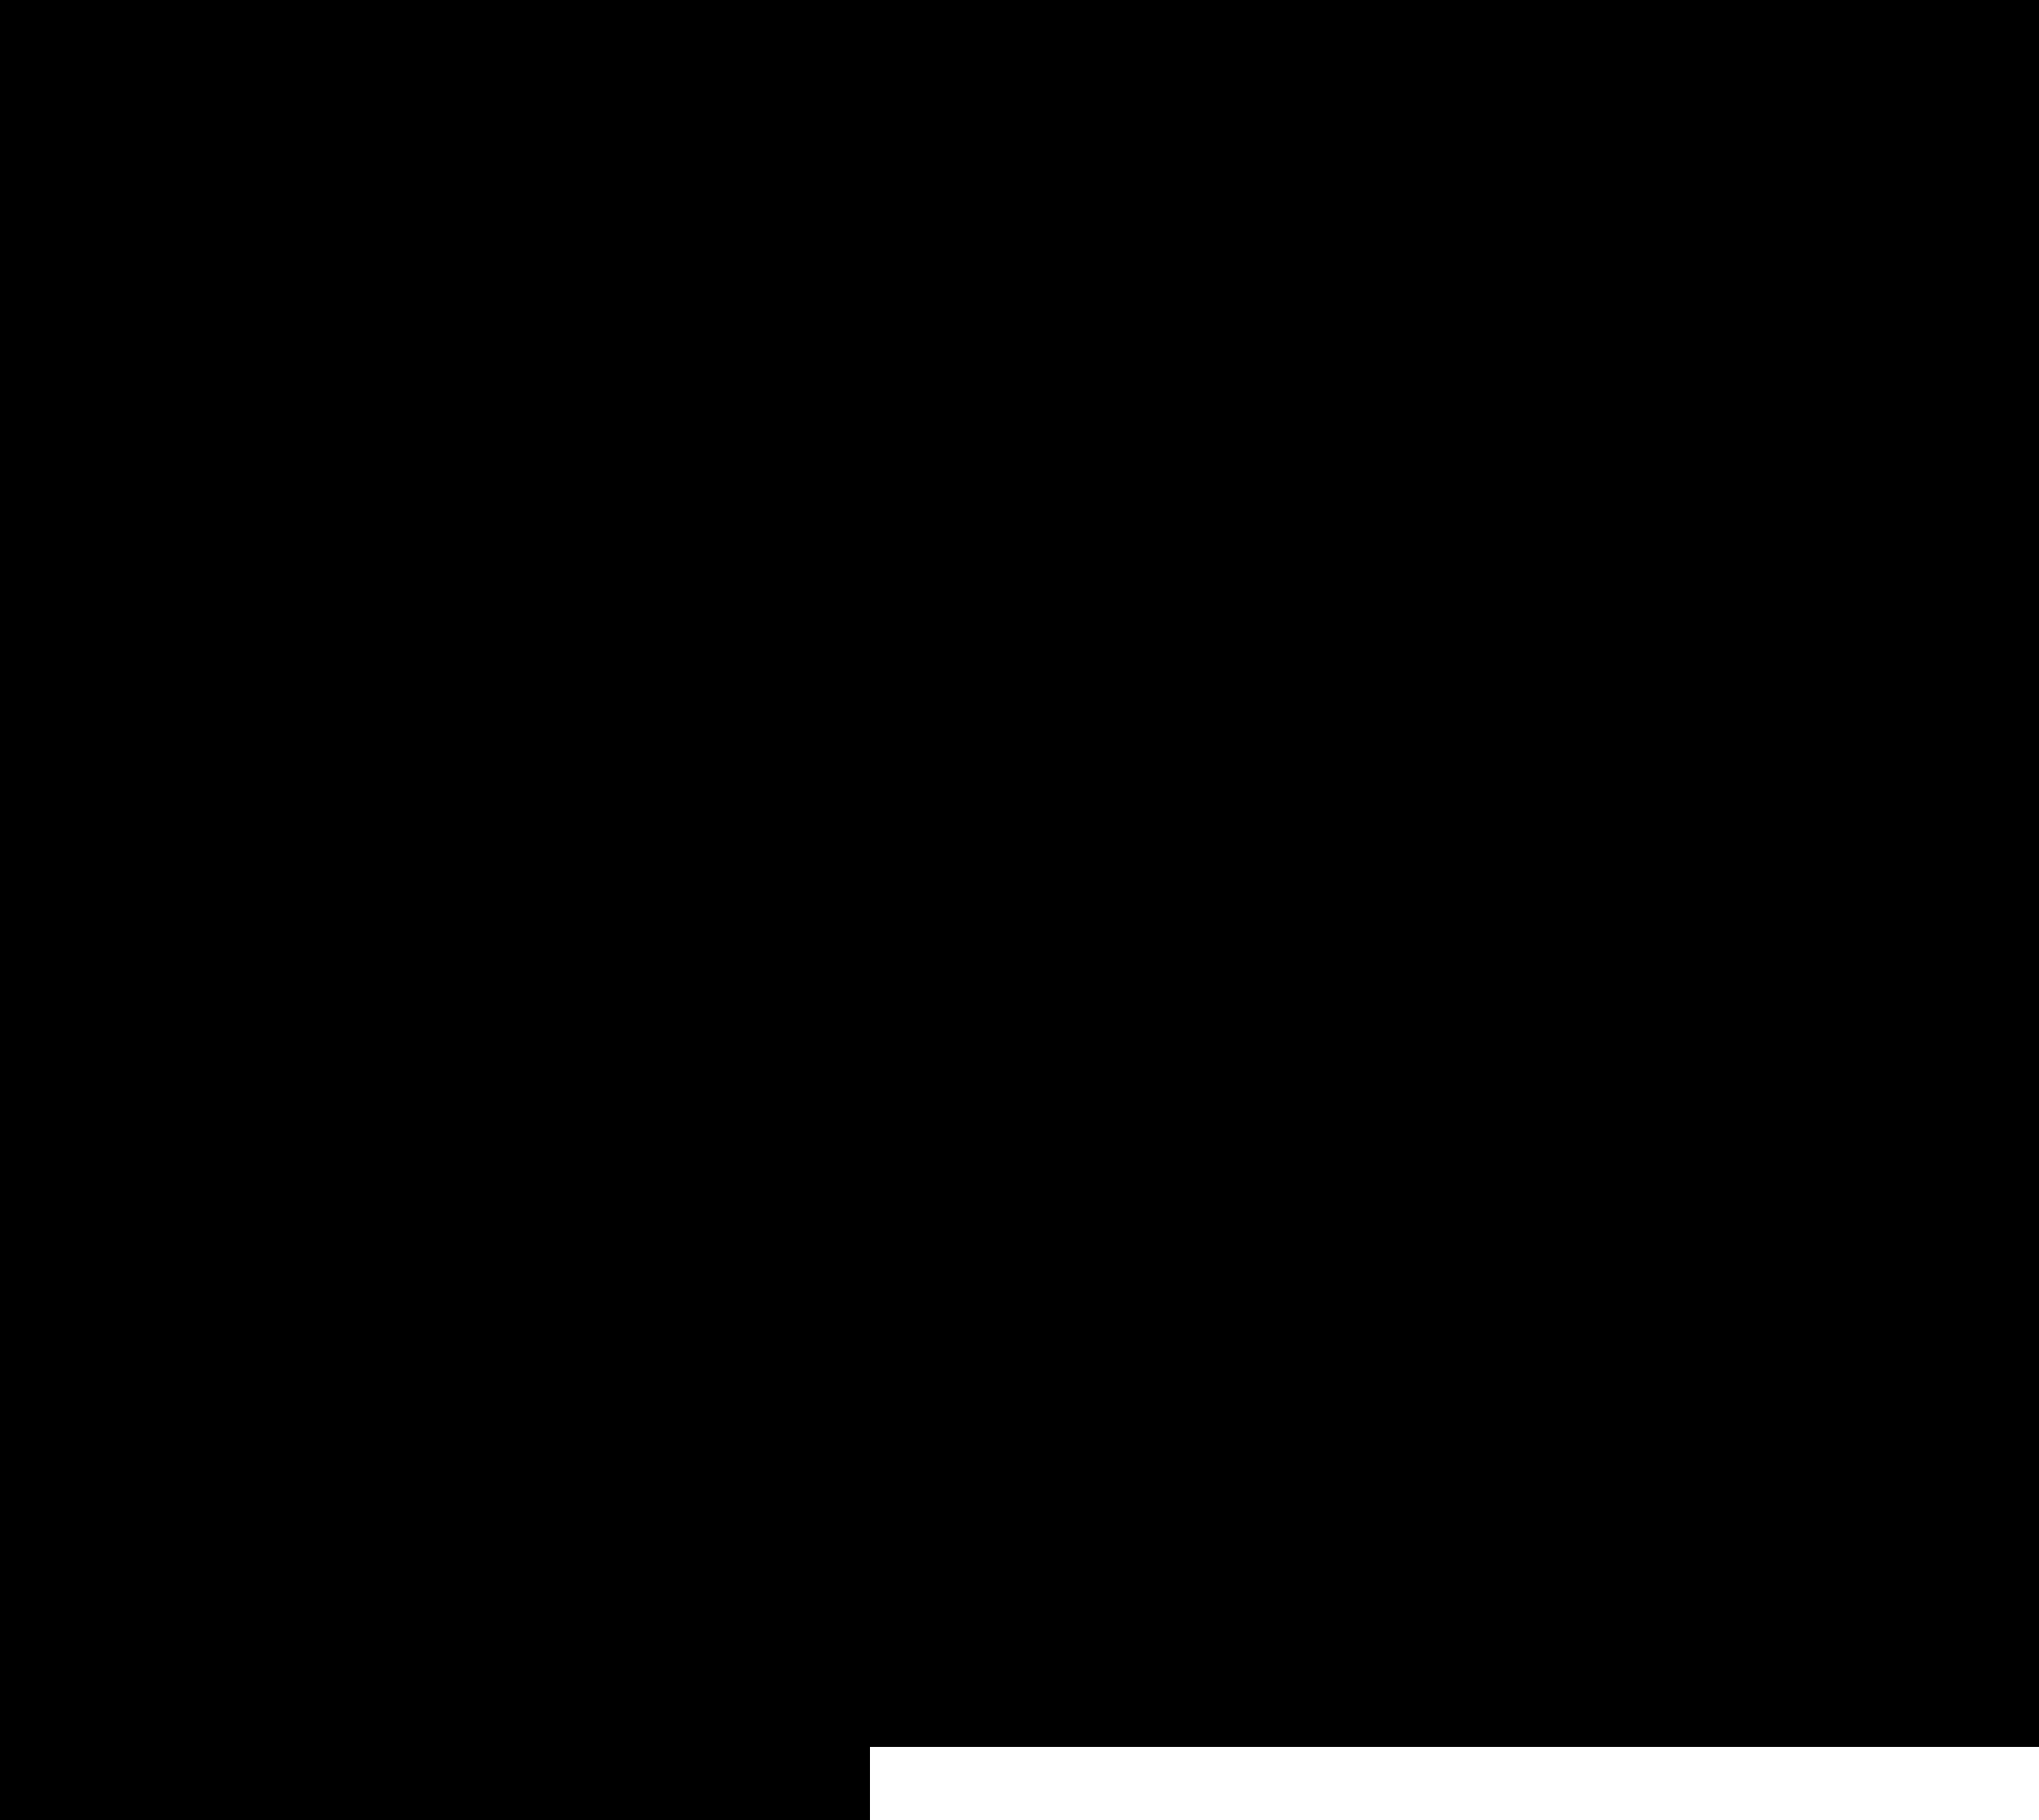 2400x2142 Taurus Bull Symbol Vector Clipart Image